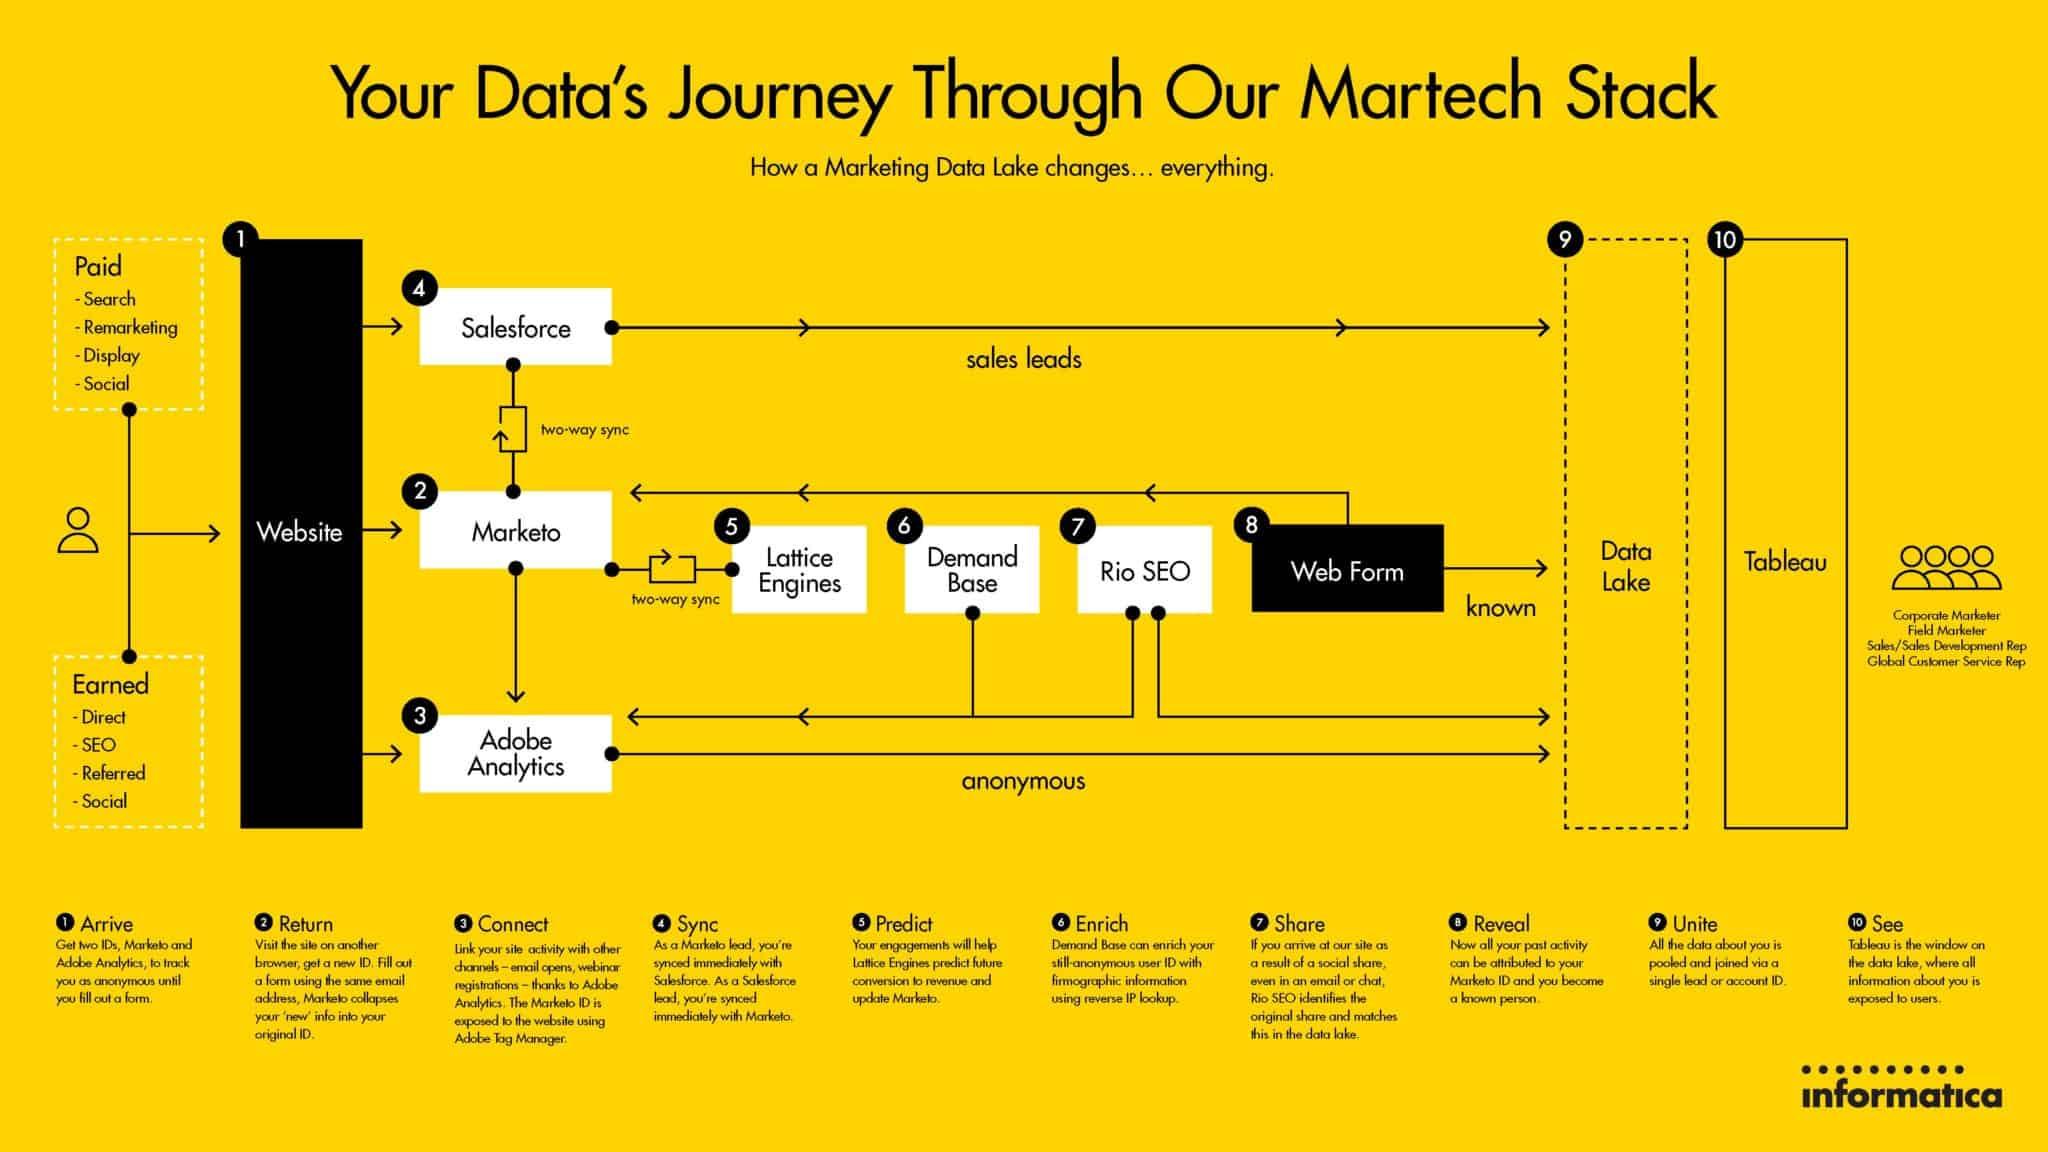 Informatica MarTech Stack